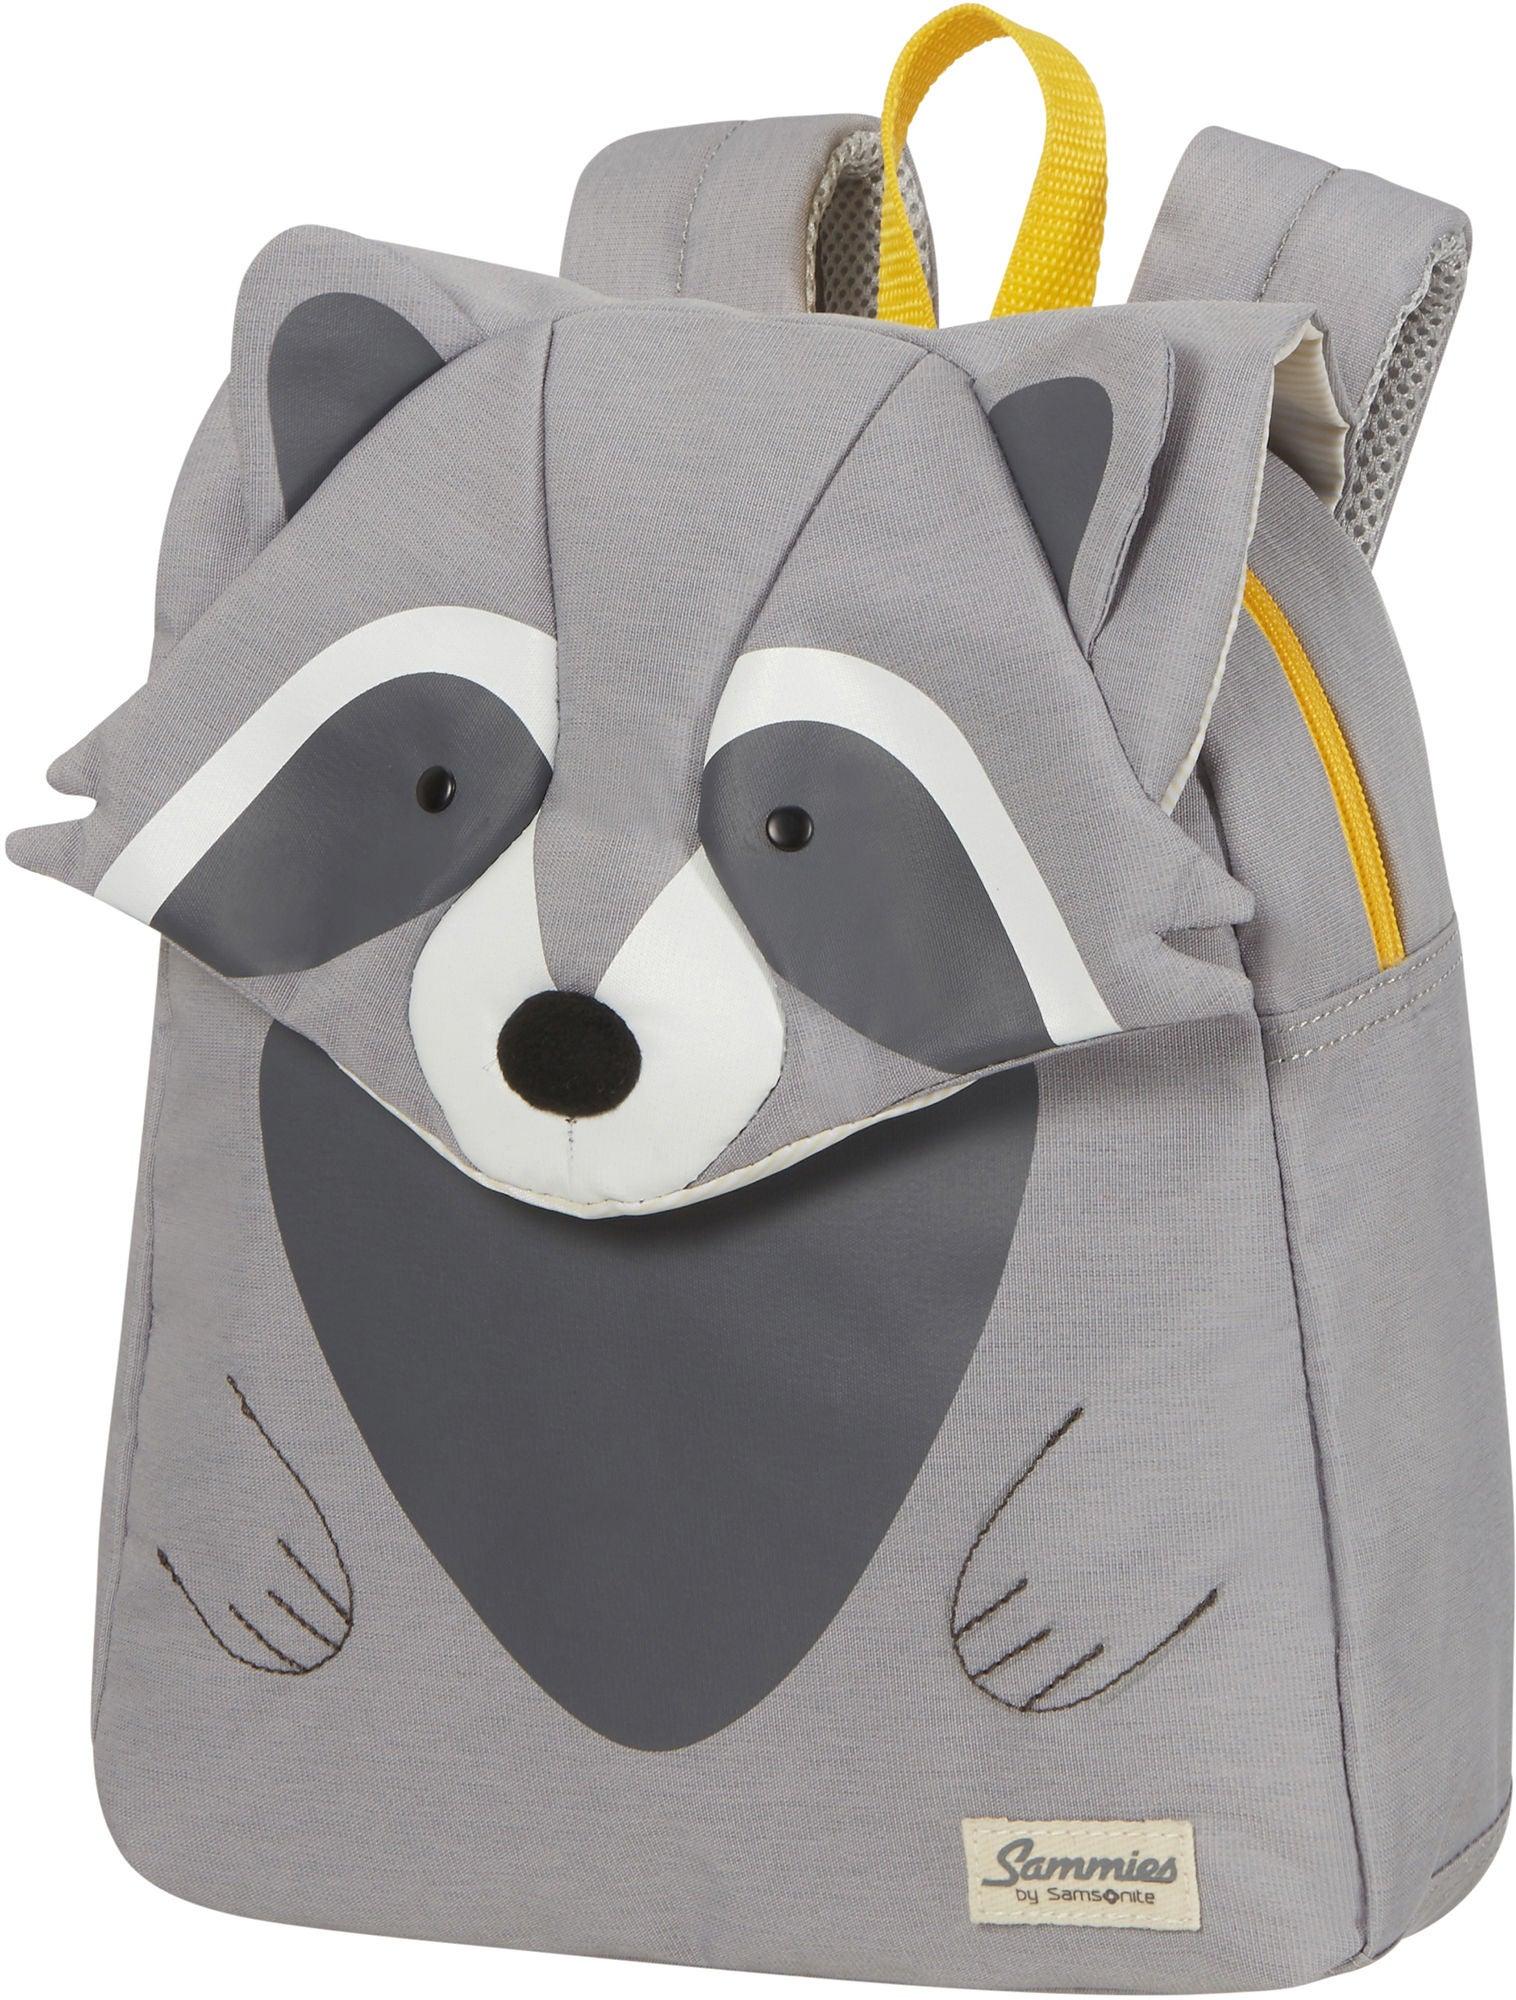 Samsonite Ryggsäck 7.5L, Raccoon Remy